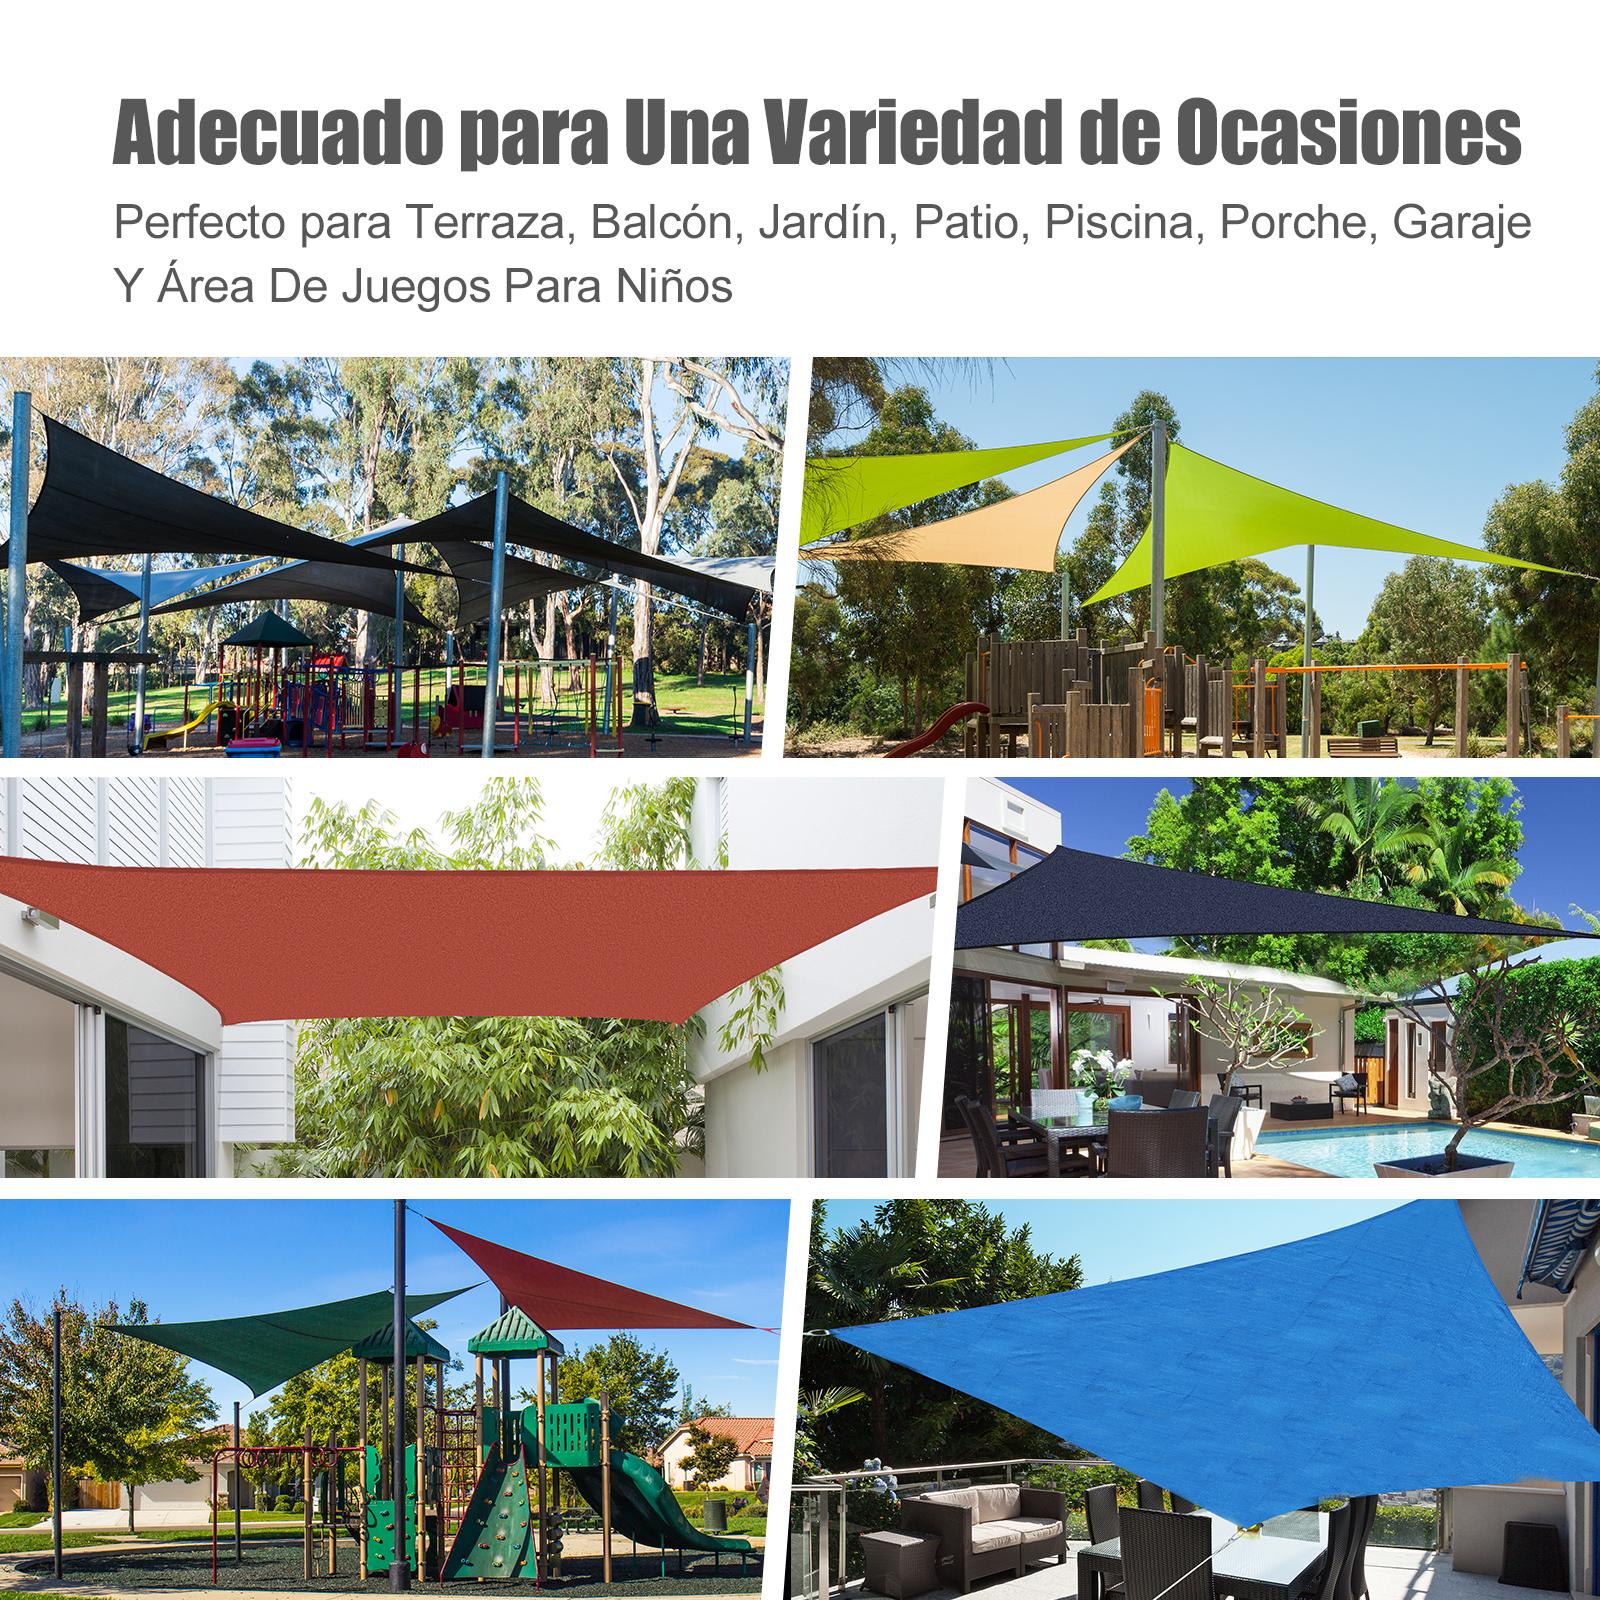 Toldo-de-Vela-Rectangular-para-Jardin-y-Exterior-Repelente-al-Agua-Proteccion-UV miniatura 7